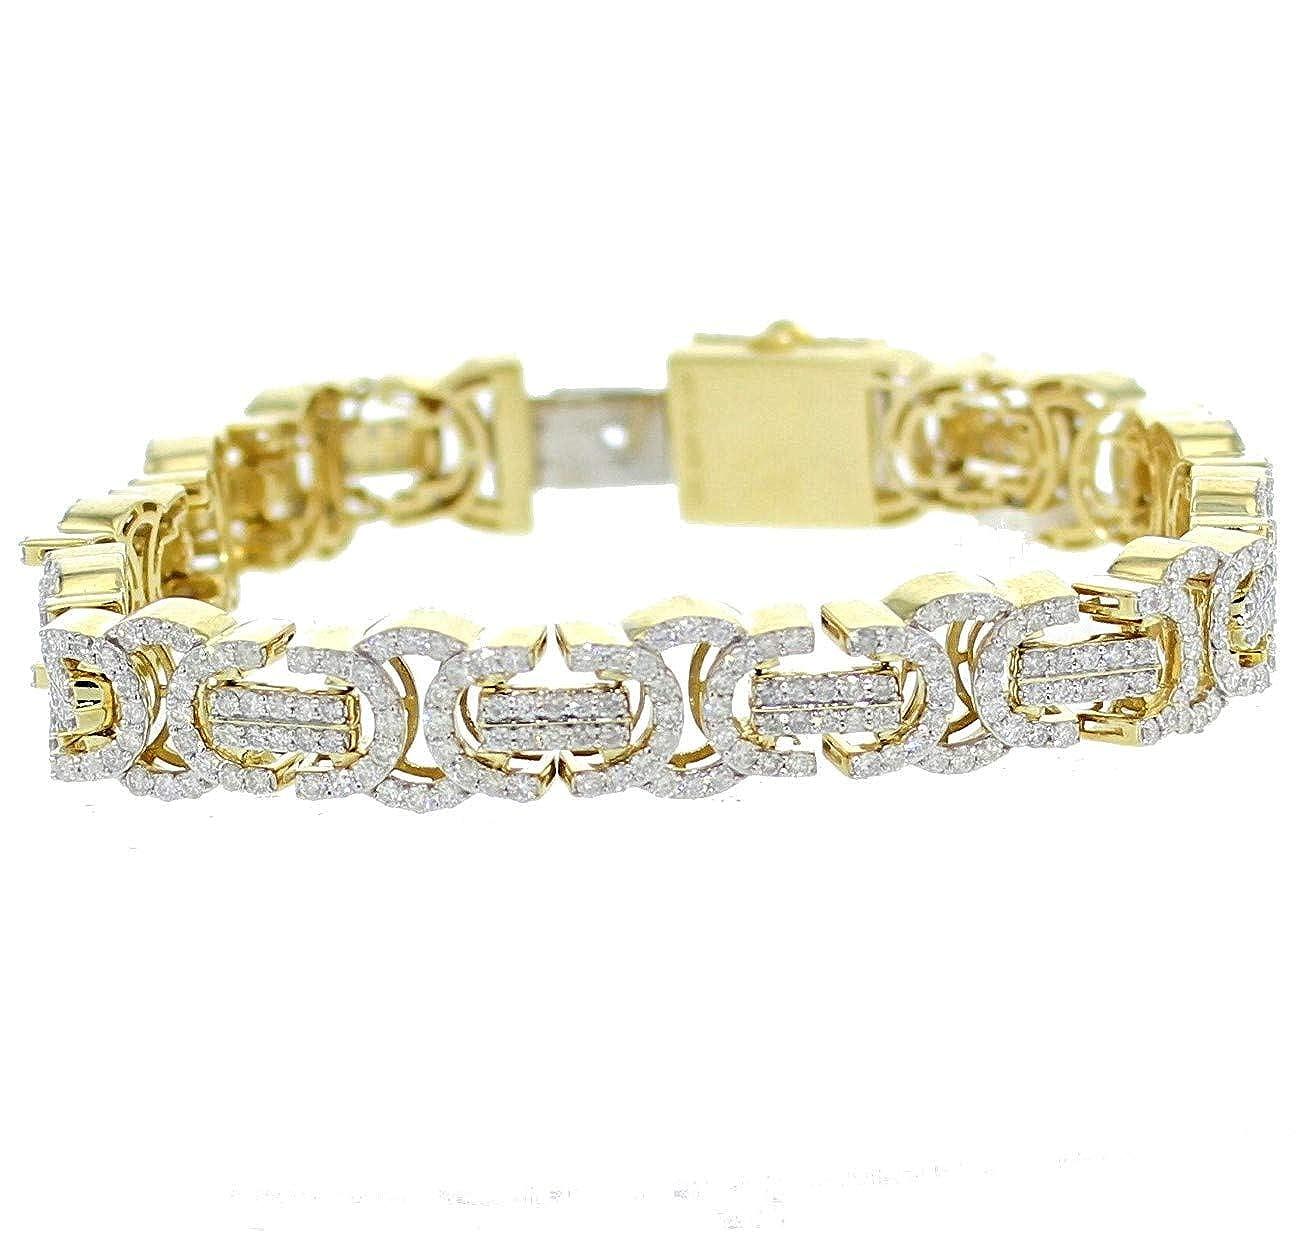 b368c2bb41b80 Amazon.com: Midwest Jewellery 10K Gold Diamond Bracelet Mens 11CTW ...